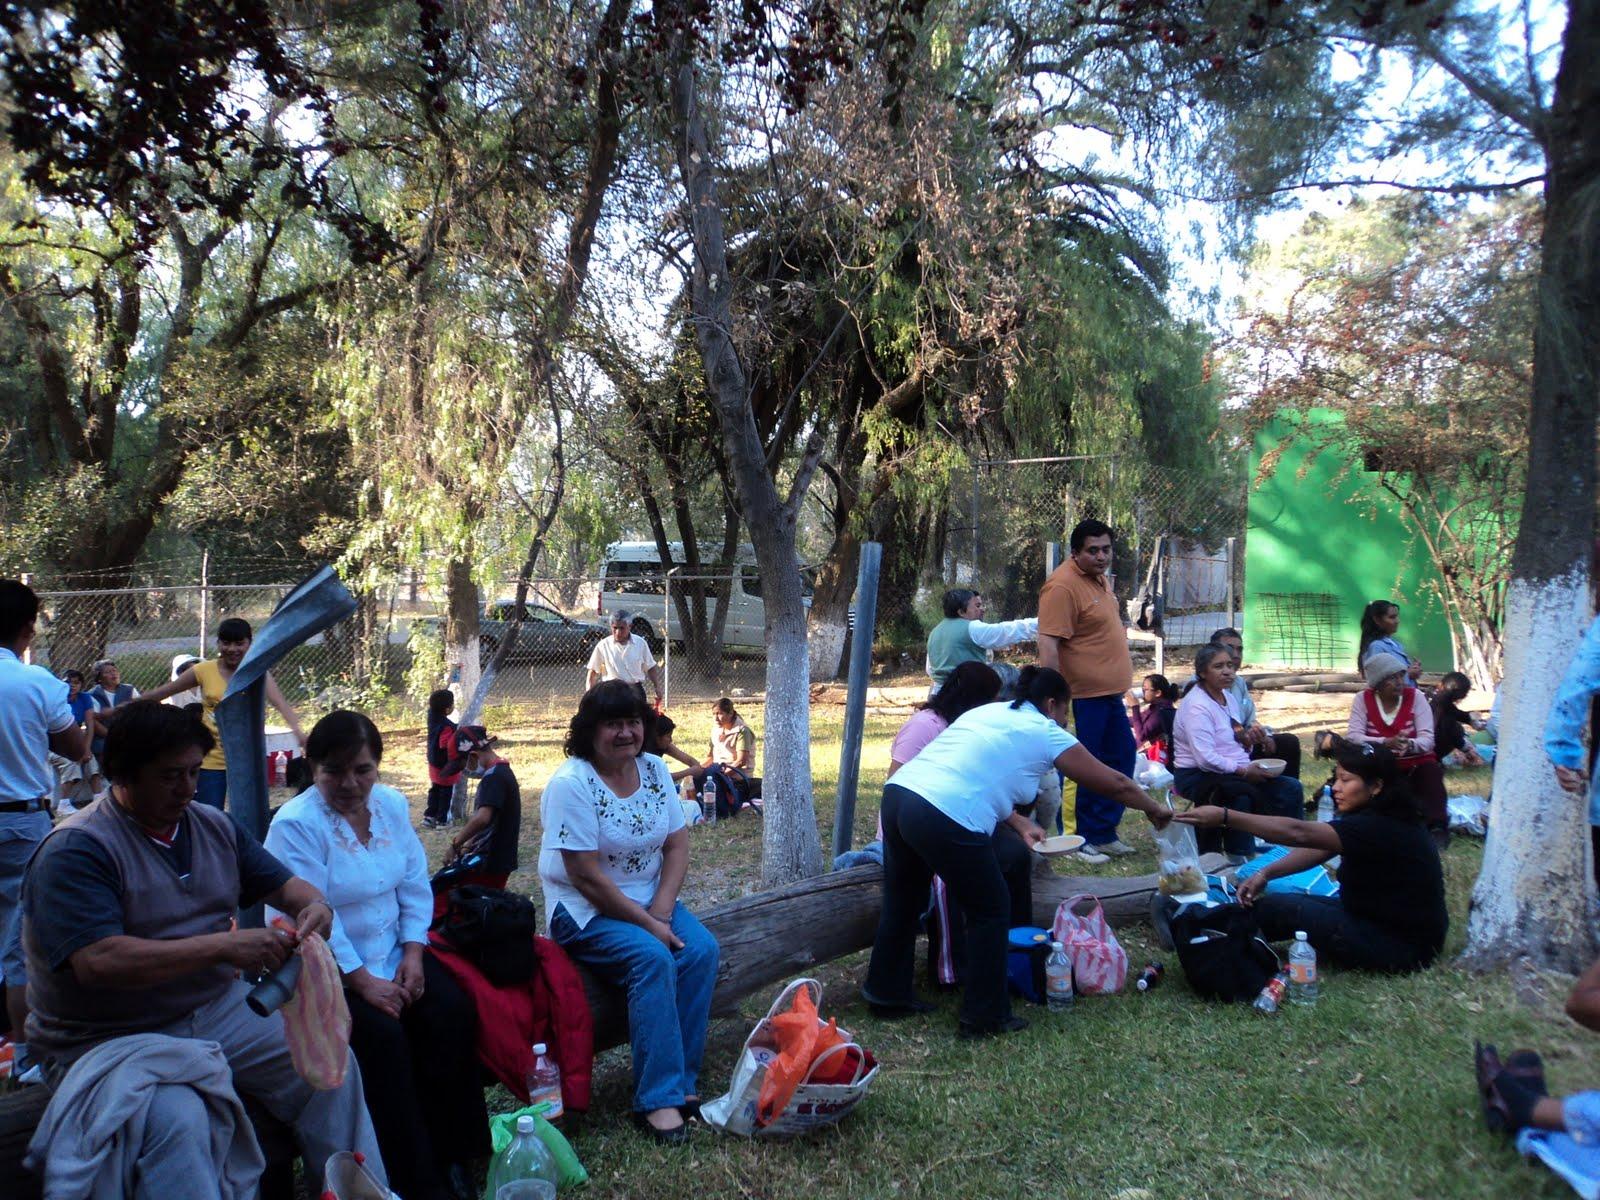 Parroquia jes s de la misericordia visita a la morenita - Casas rurales la morenita ...